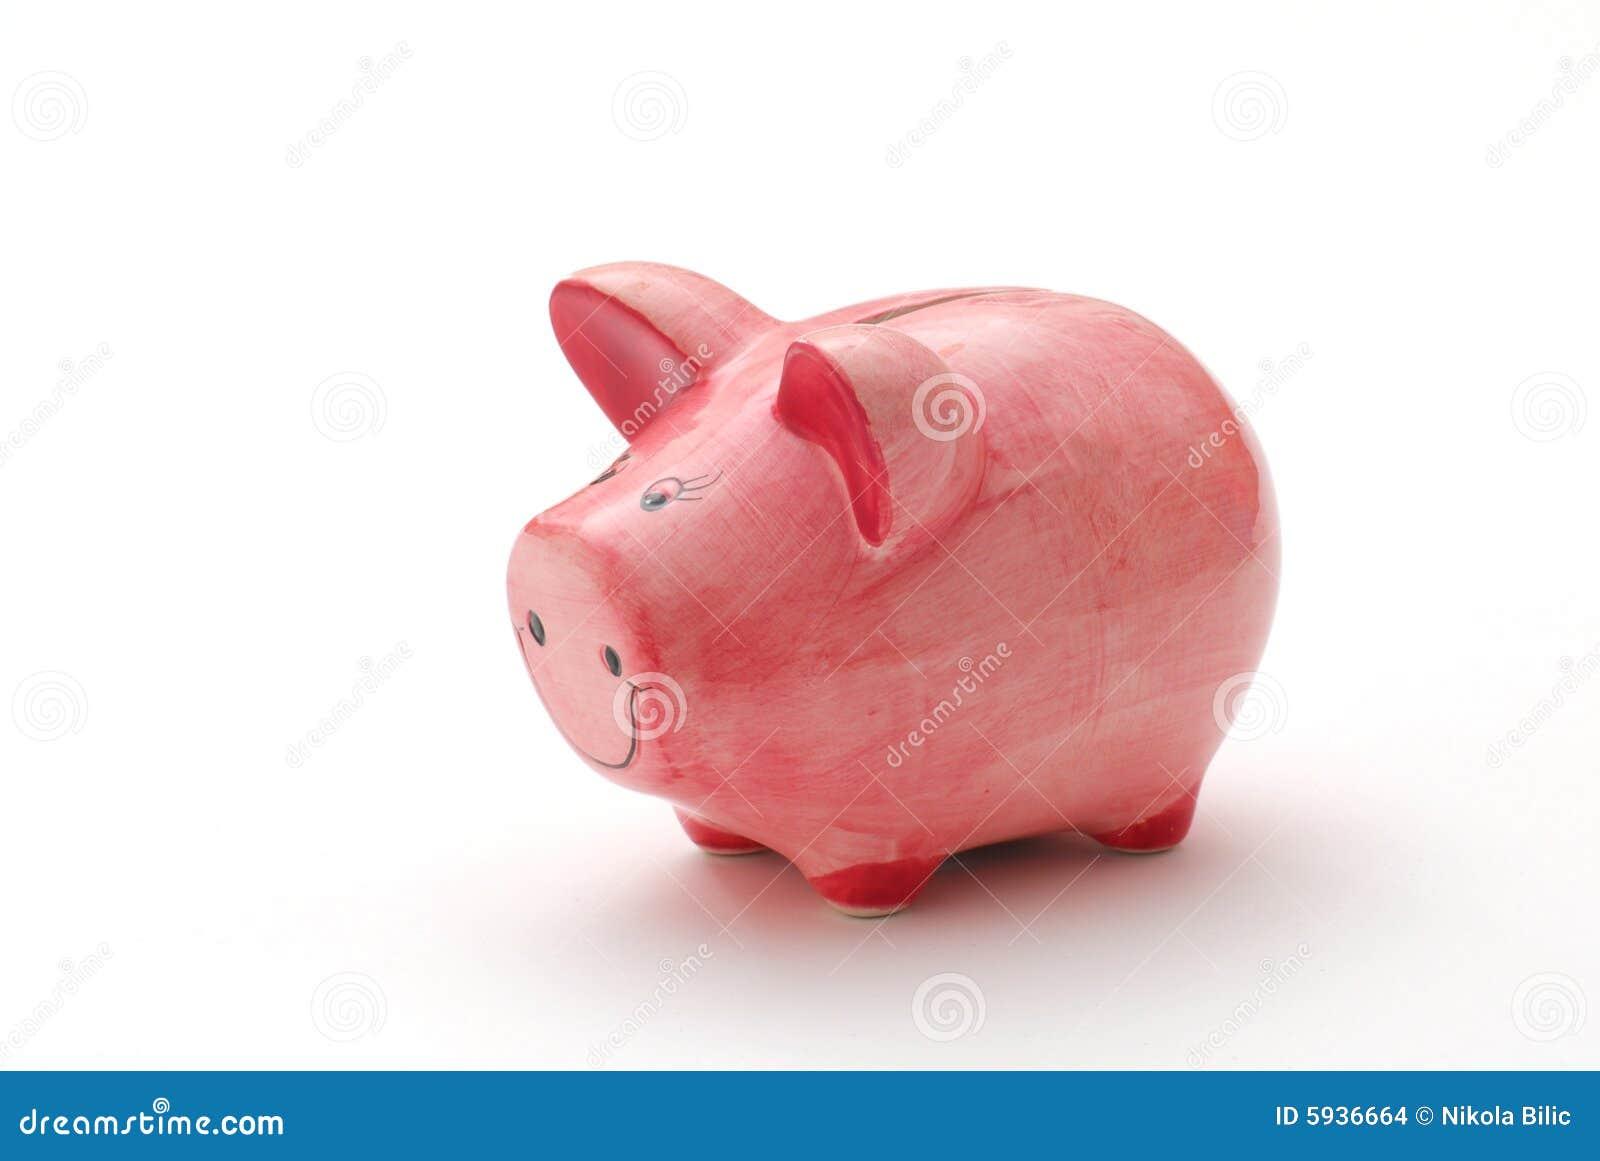 świnka banku